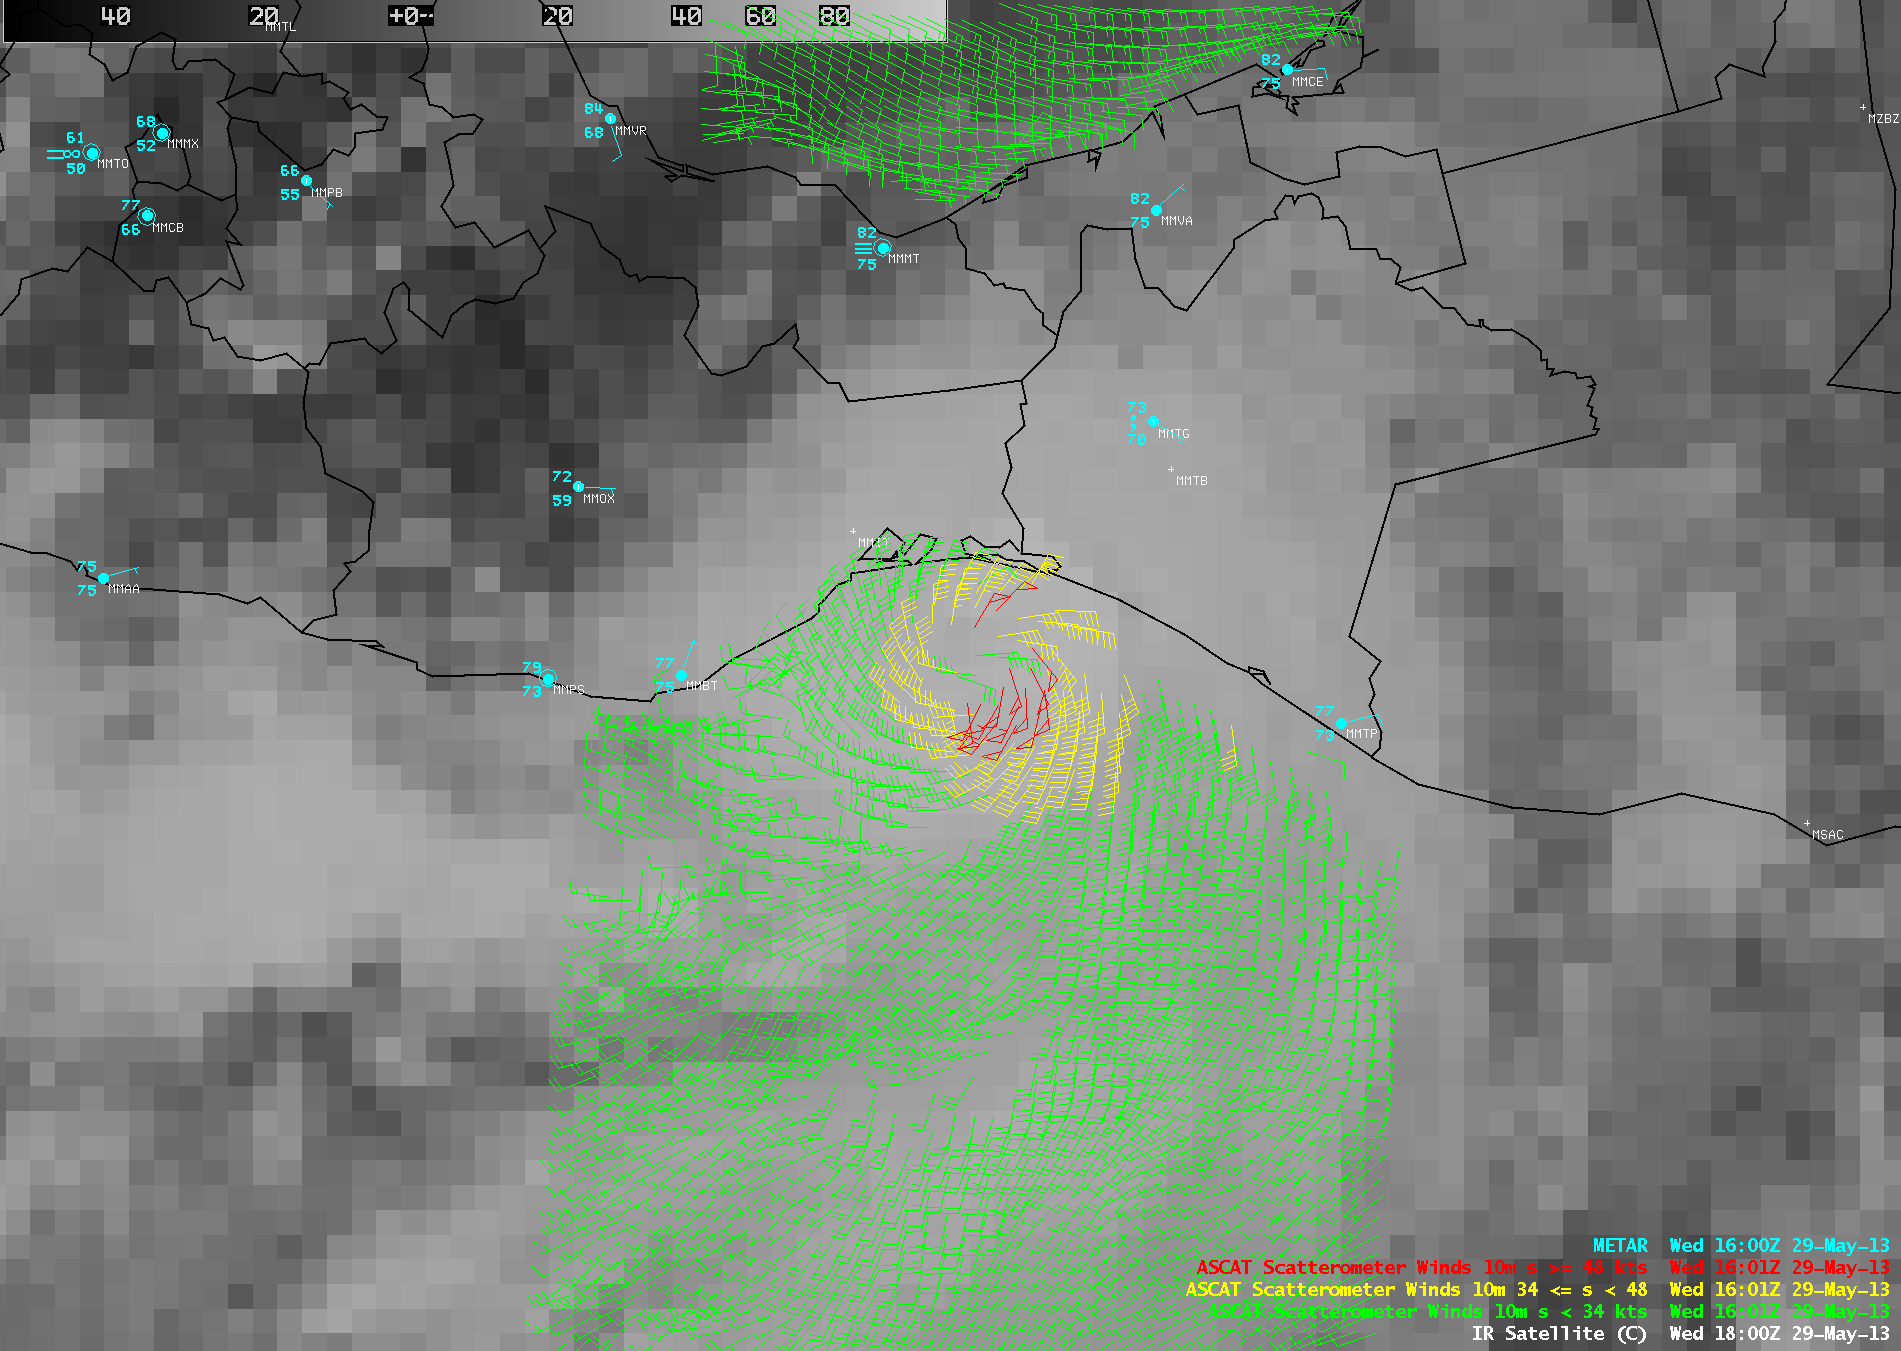 ASCAT surface scatterometer winds